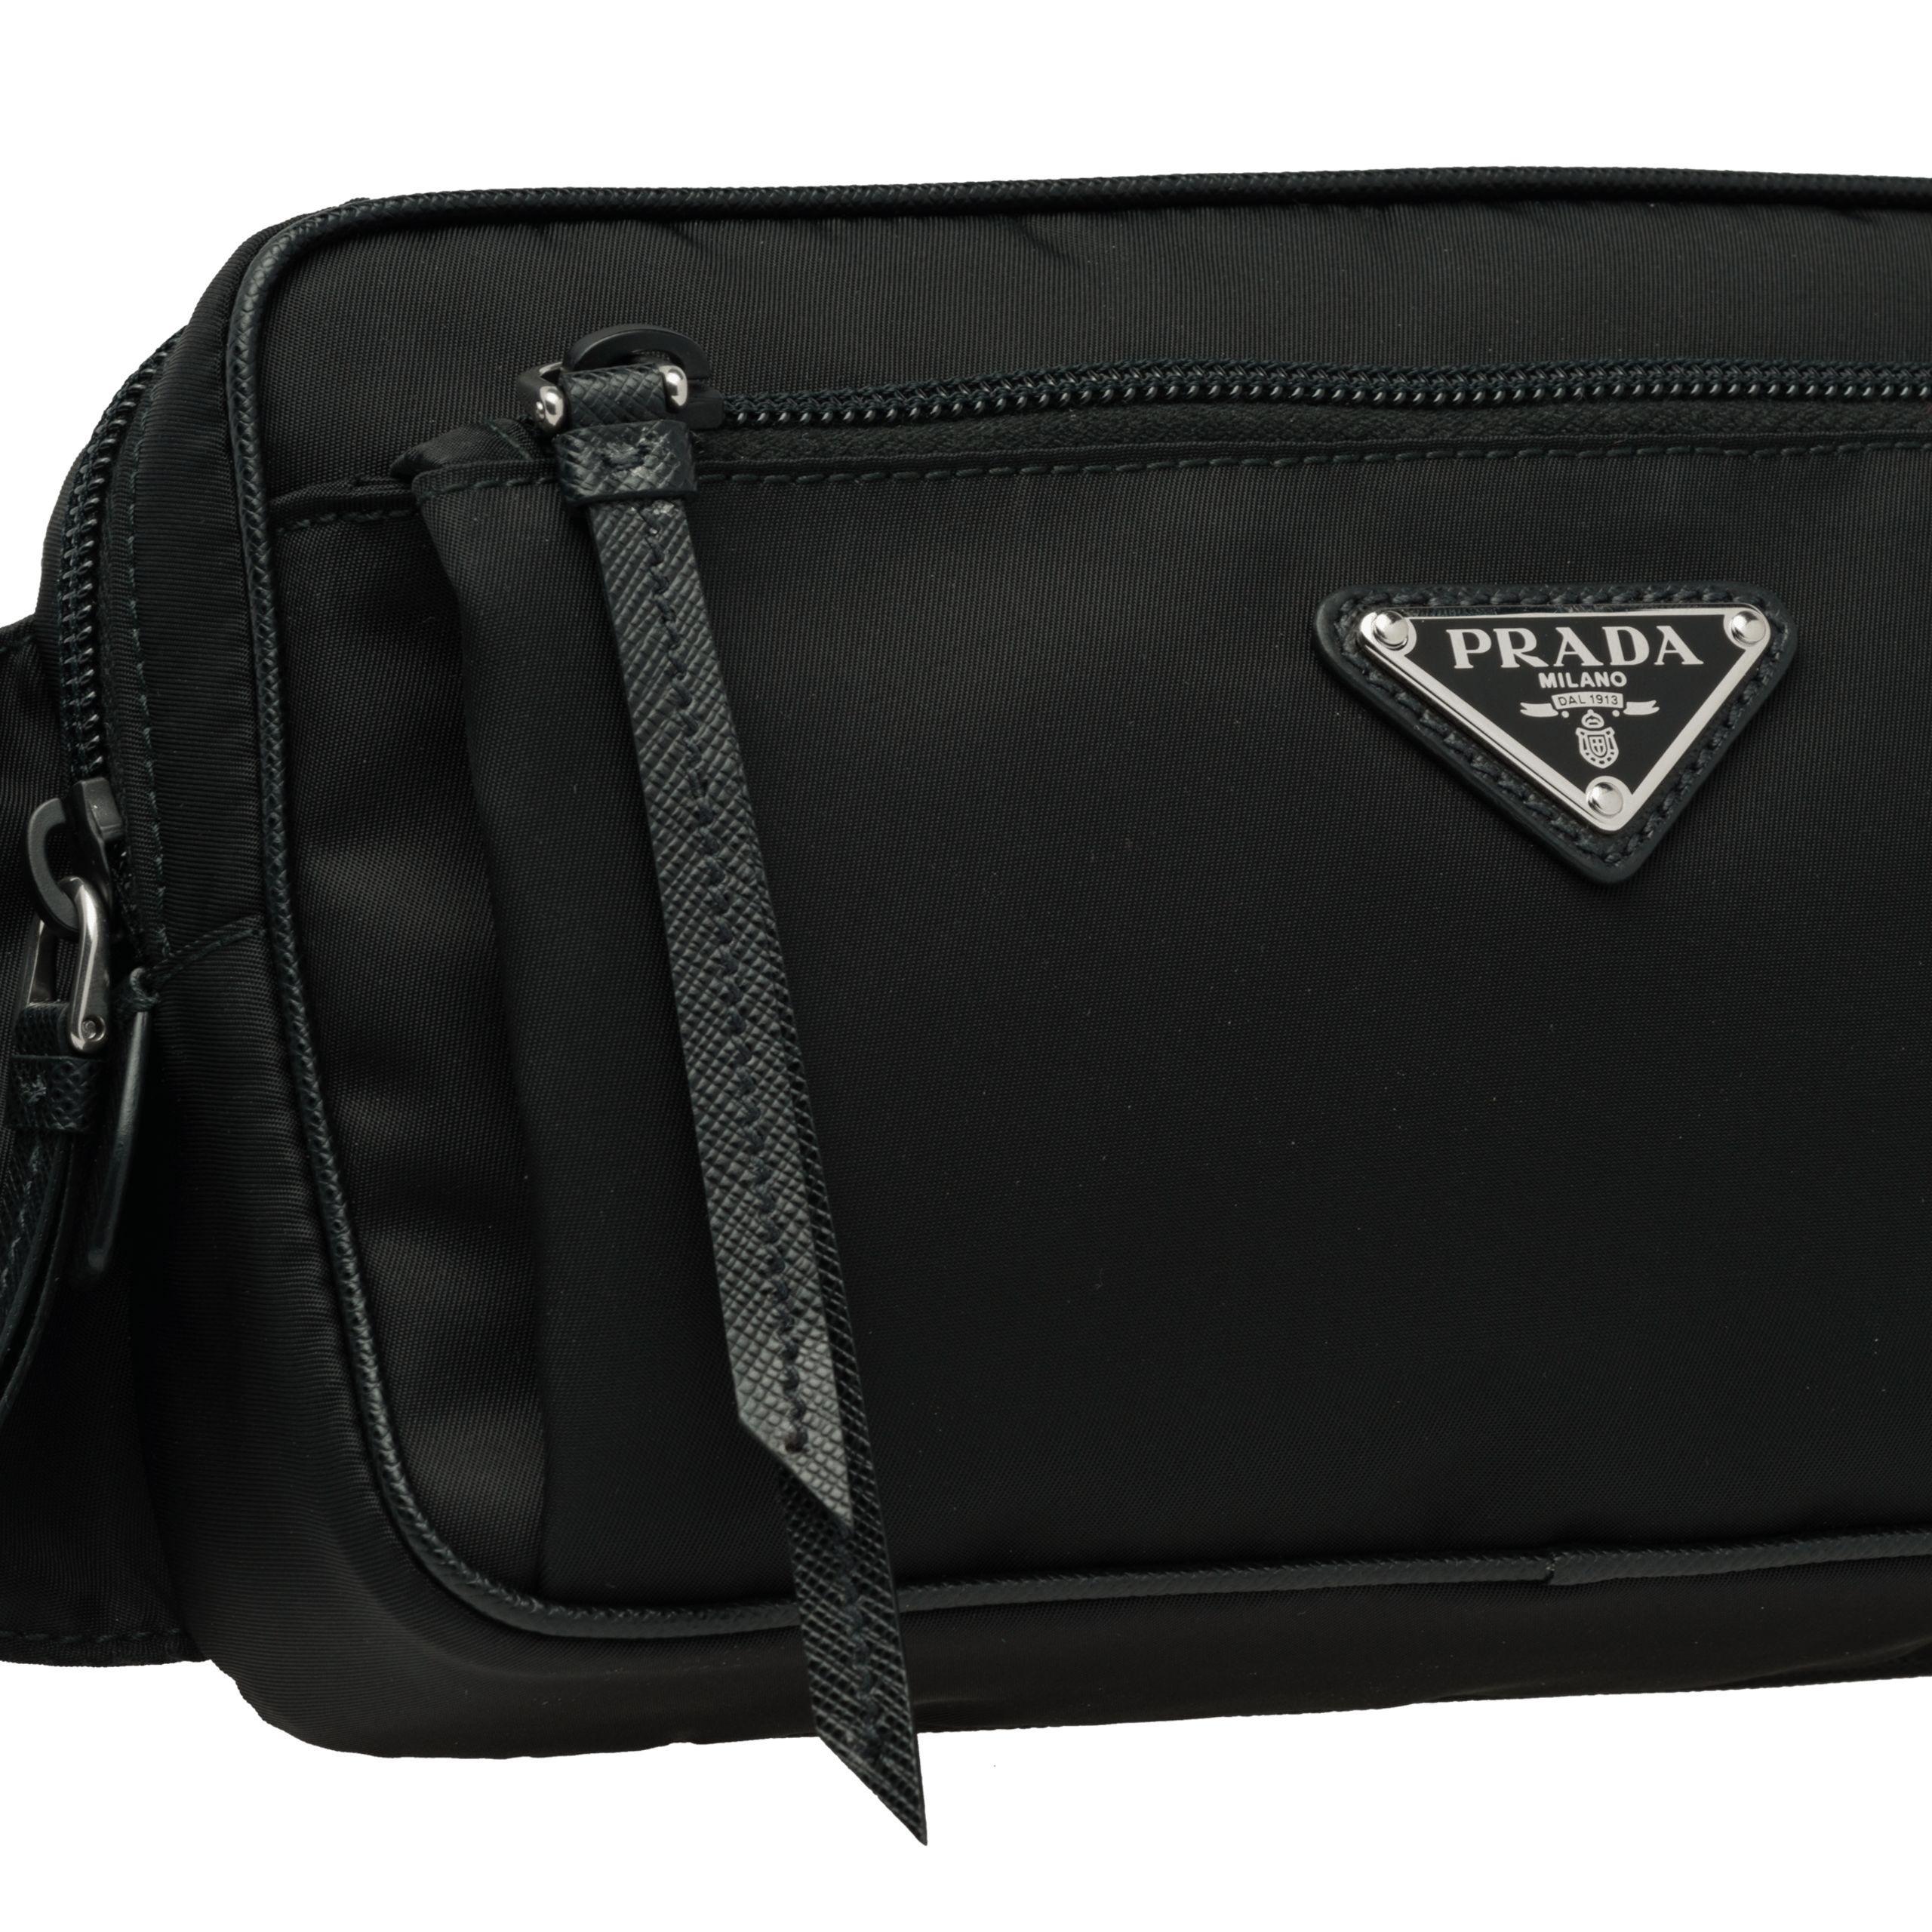 143758430464 Prada - Black Nylon And Leather Belt Bag - Lyst. View fullscreen